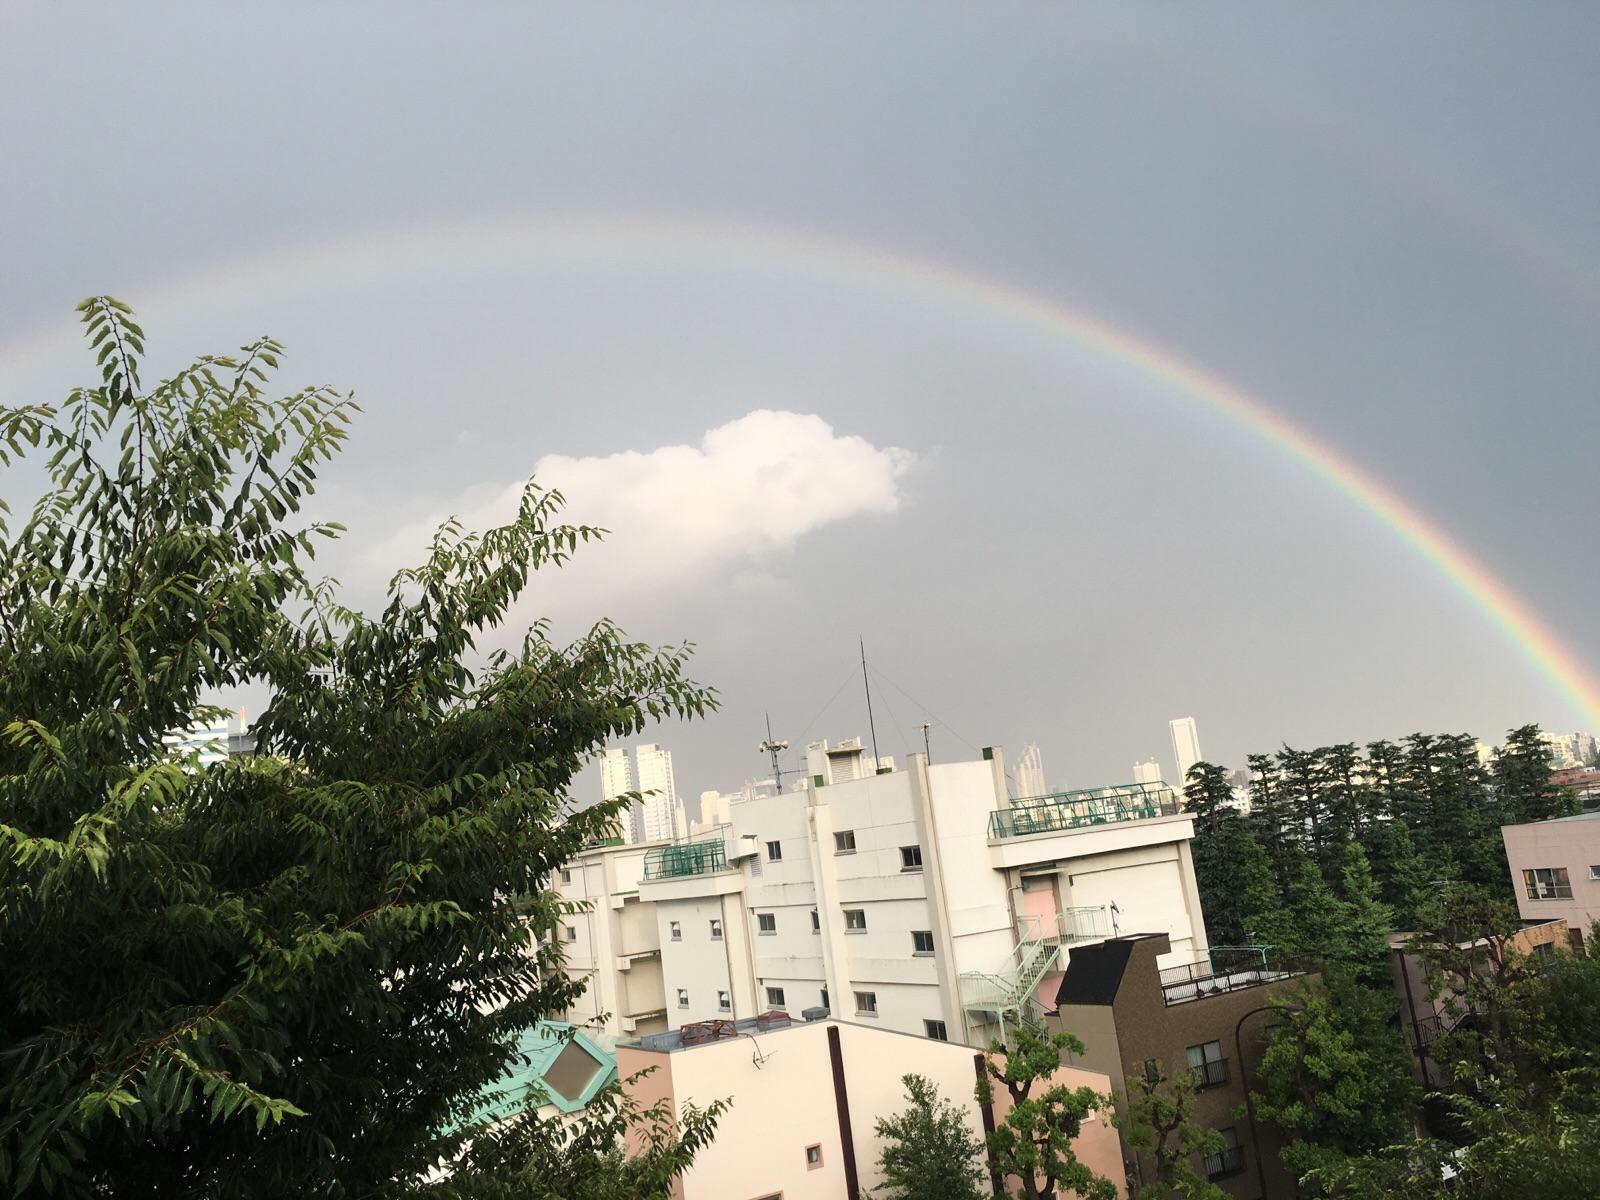 Rainbow in Brazil